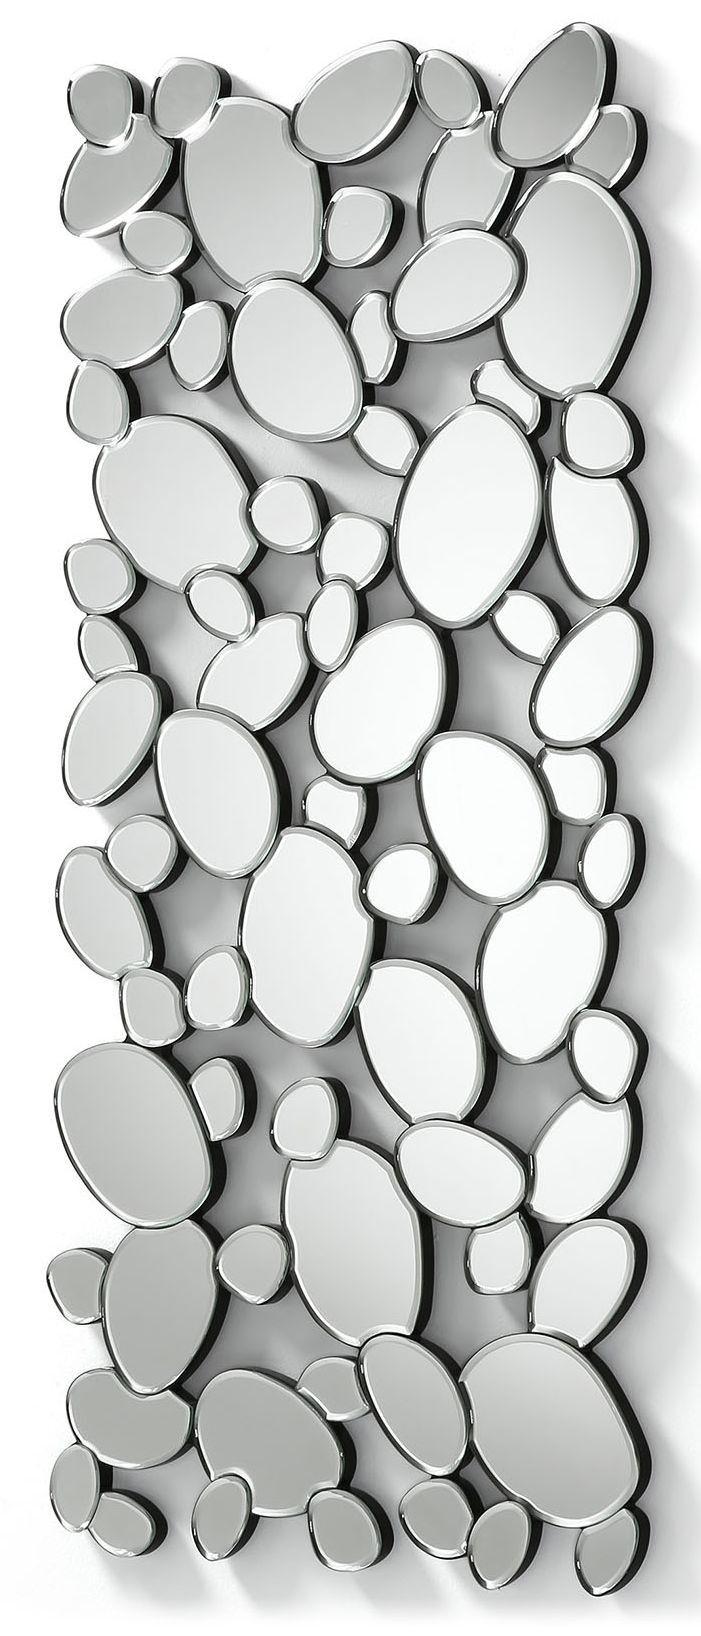 17 beste idee n over woonkamer spiegels op pinterest kelder appartement decor gezellige - Designer woonkamer spiegel ...